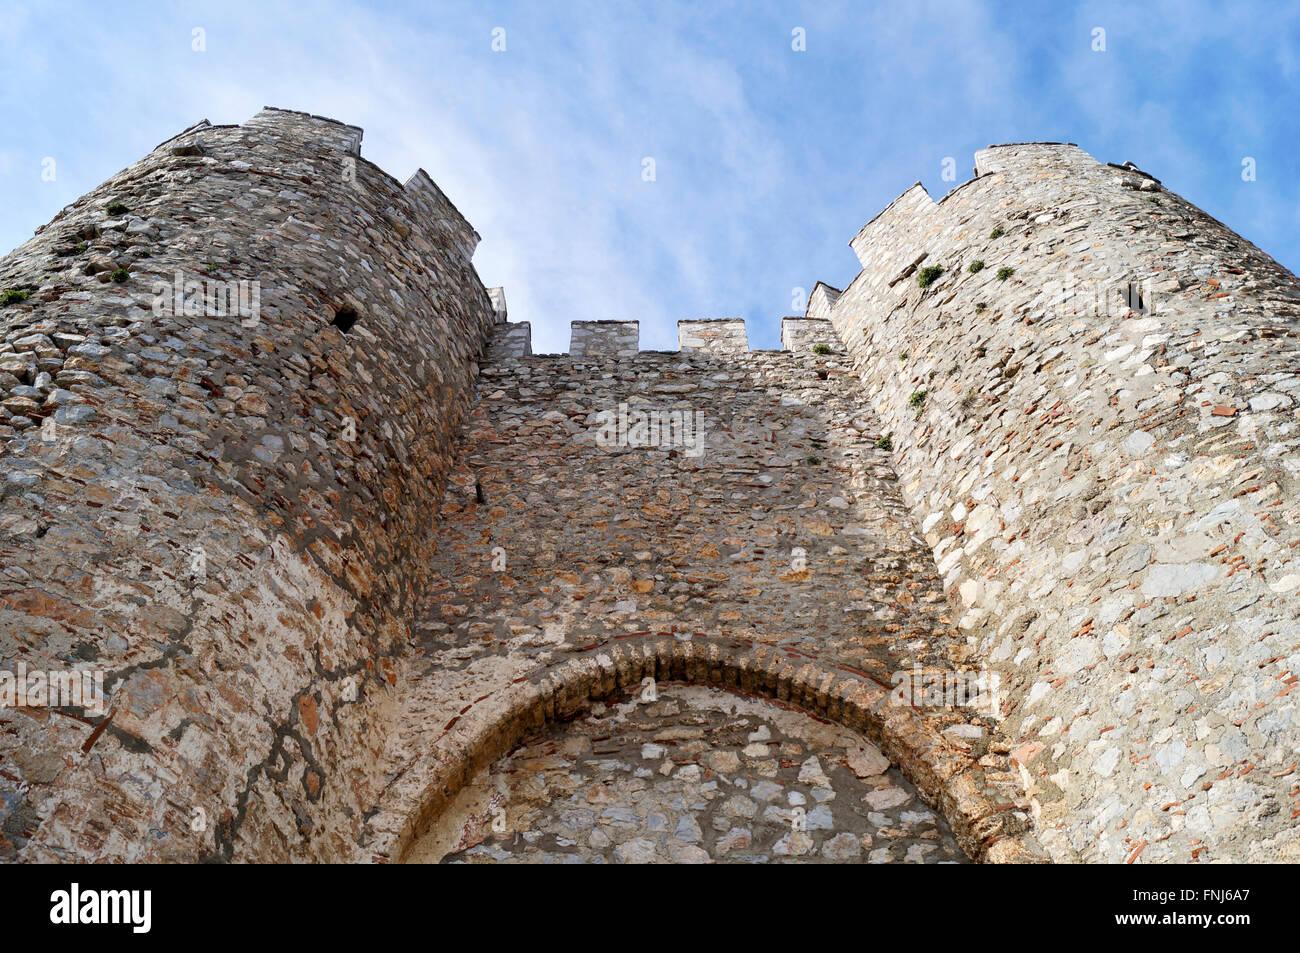 Tsar Samuel's fortress in Ohrid, Macedonia - Stock Image